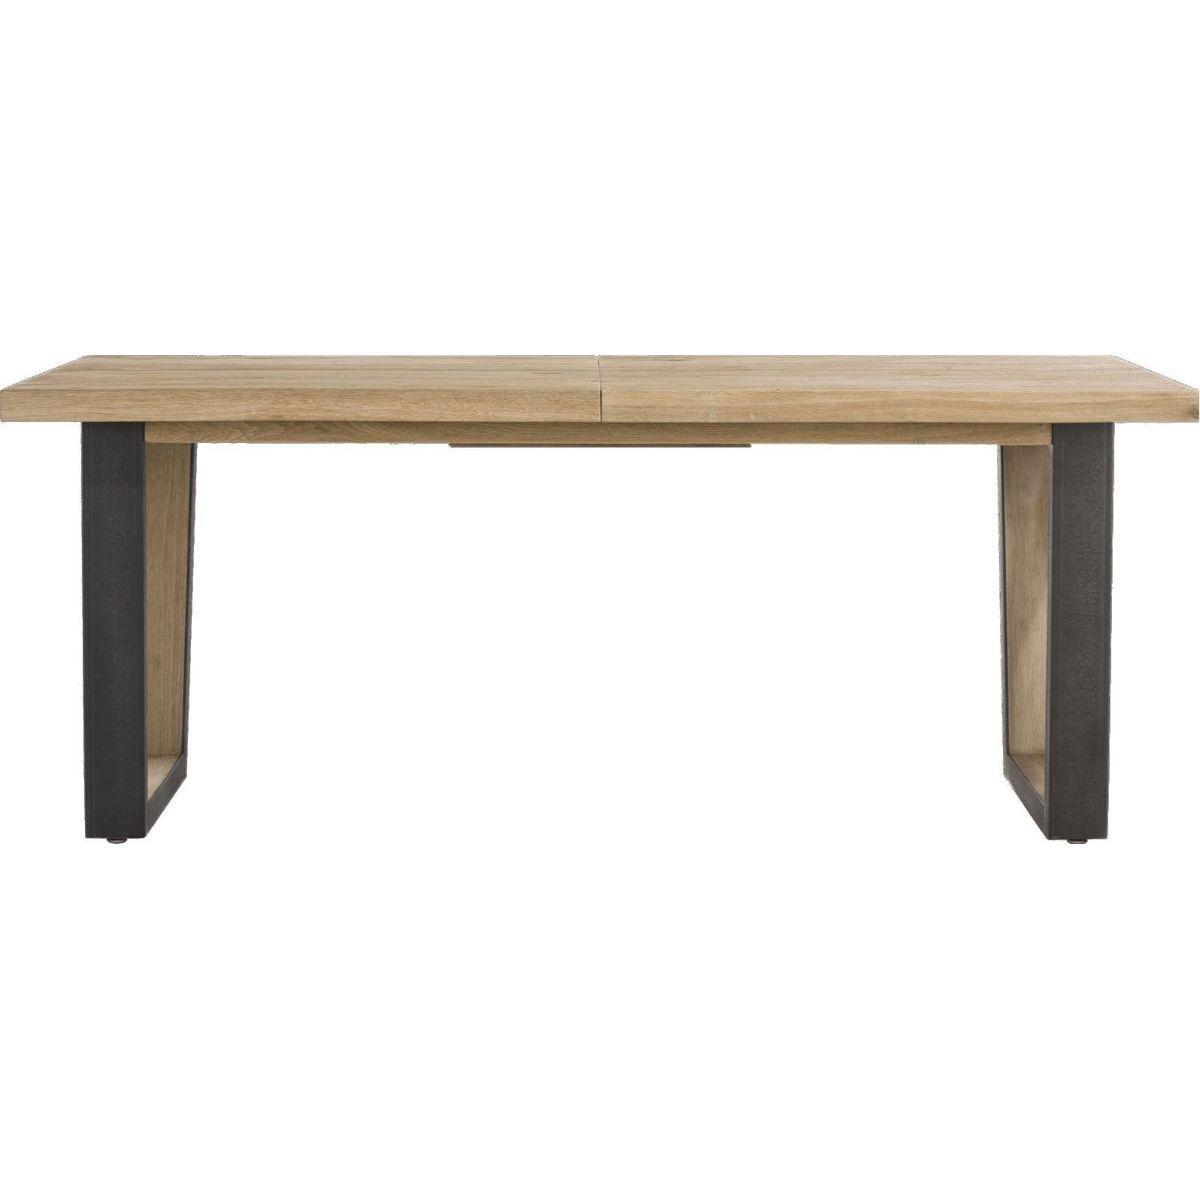 Table à rallonge METALOX HetH 190x100cm